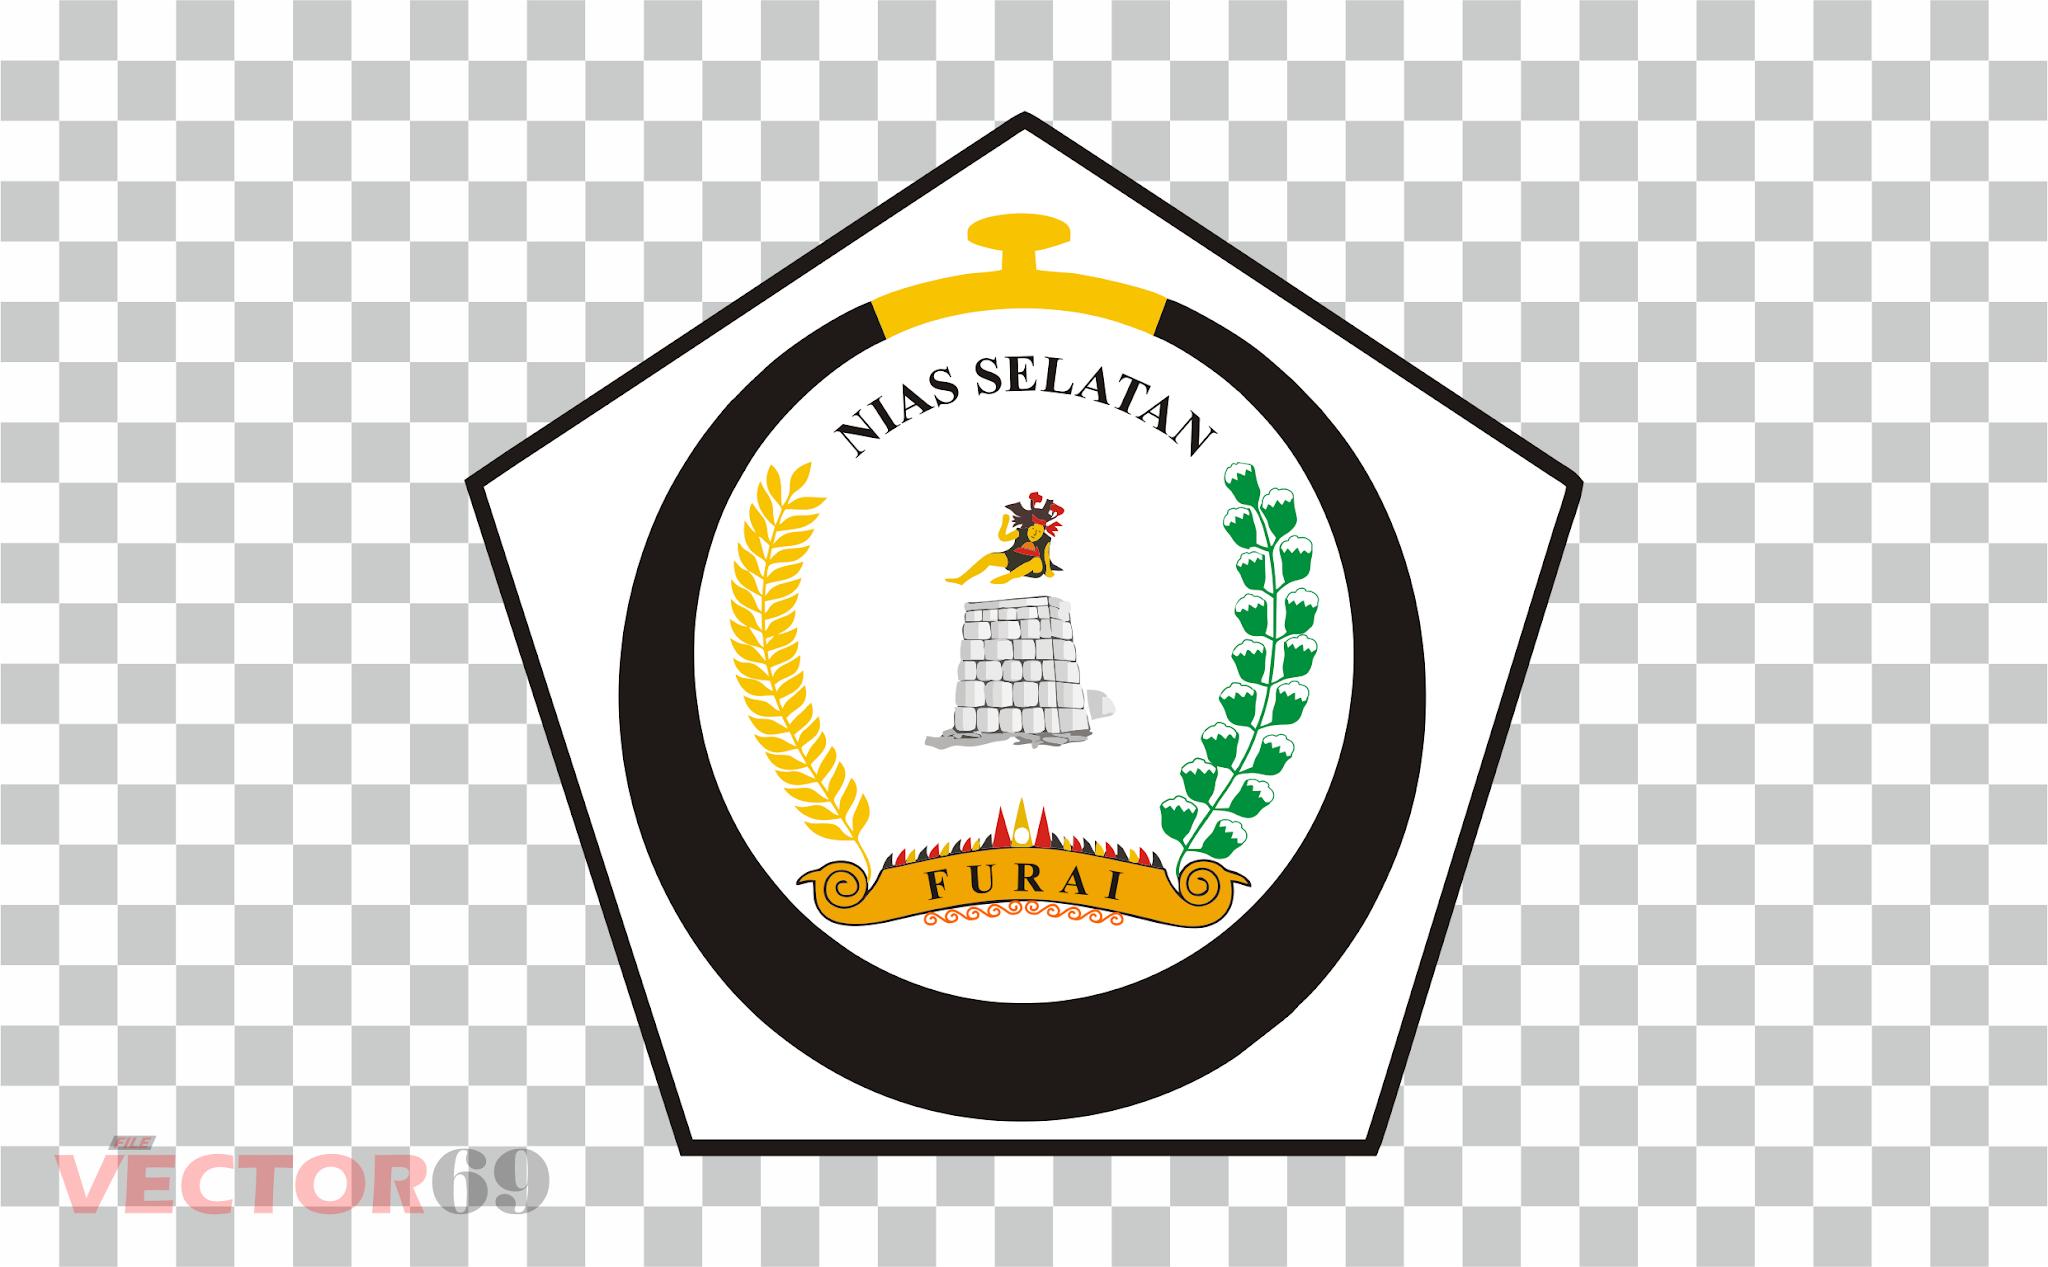 Kabupaten Nias Selatan Logo - Download Vector File PNG (Portable Network Graphics)